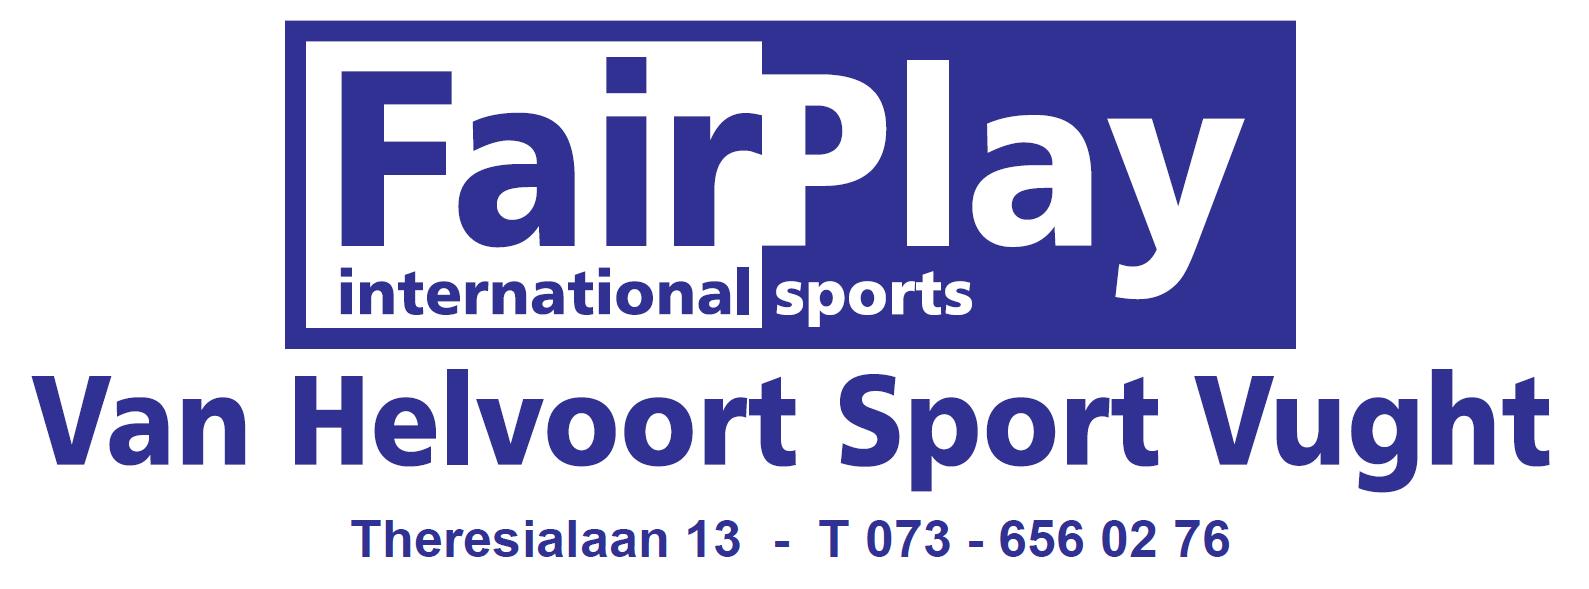 http://www.vanhelvoortsport.nl/